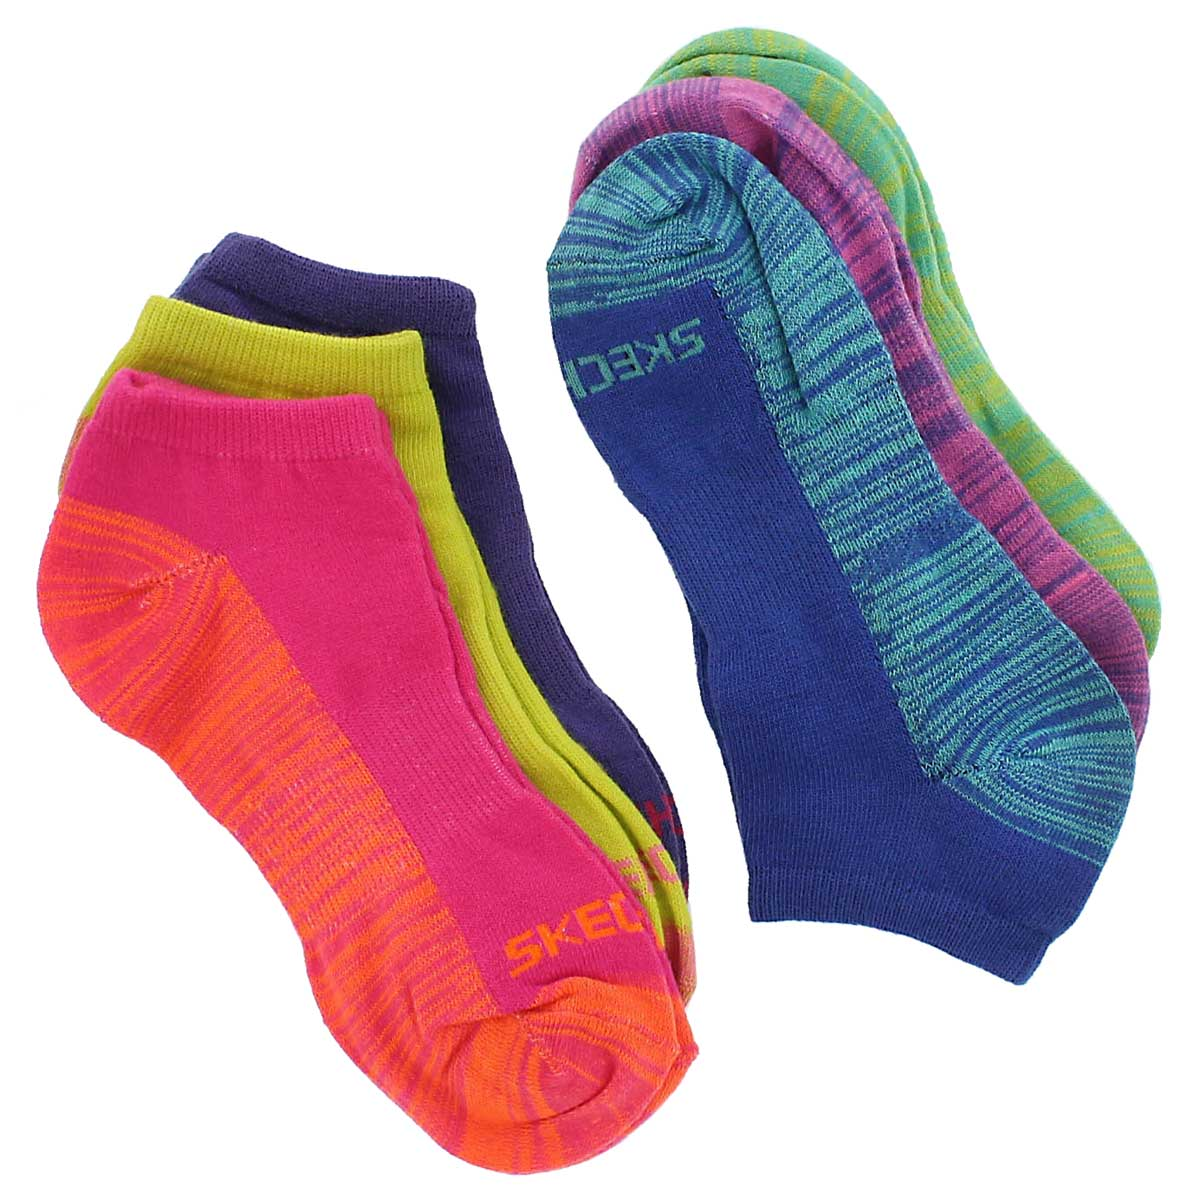 Grls Low Cut Non Terry multi socks